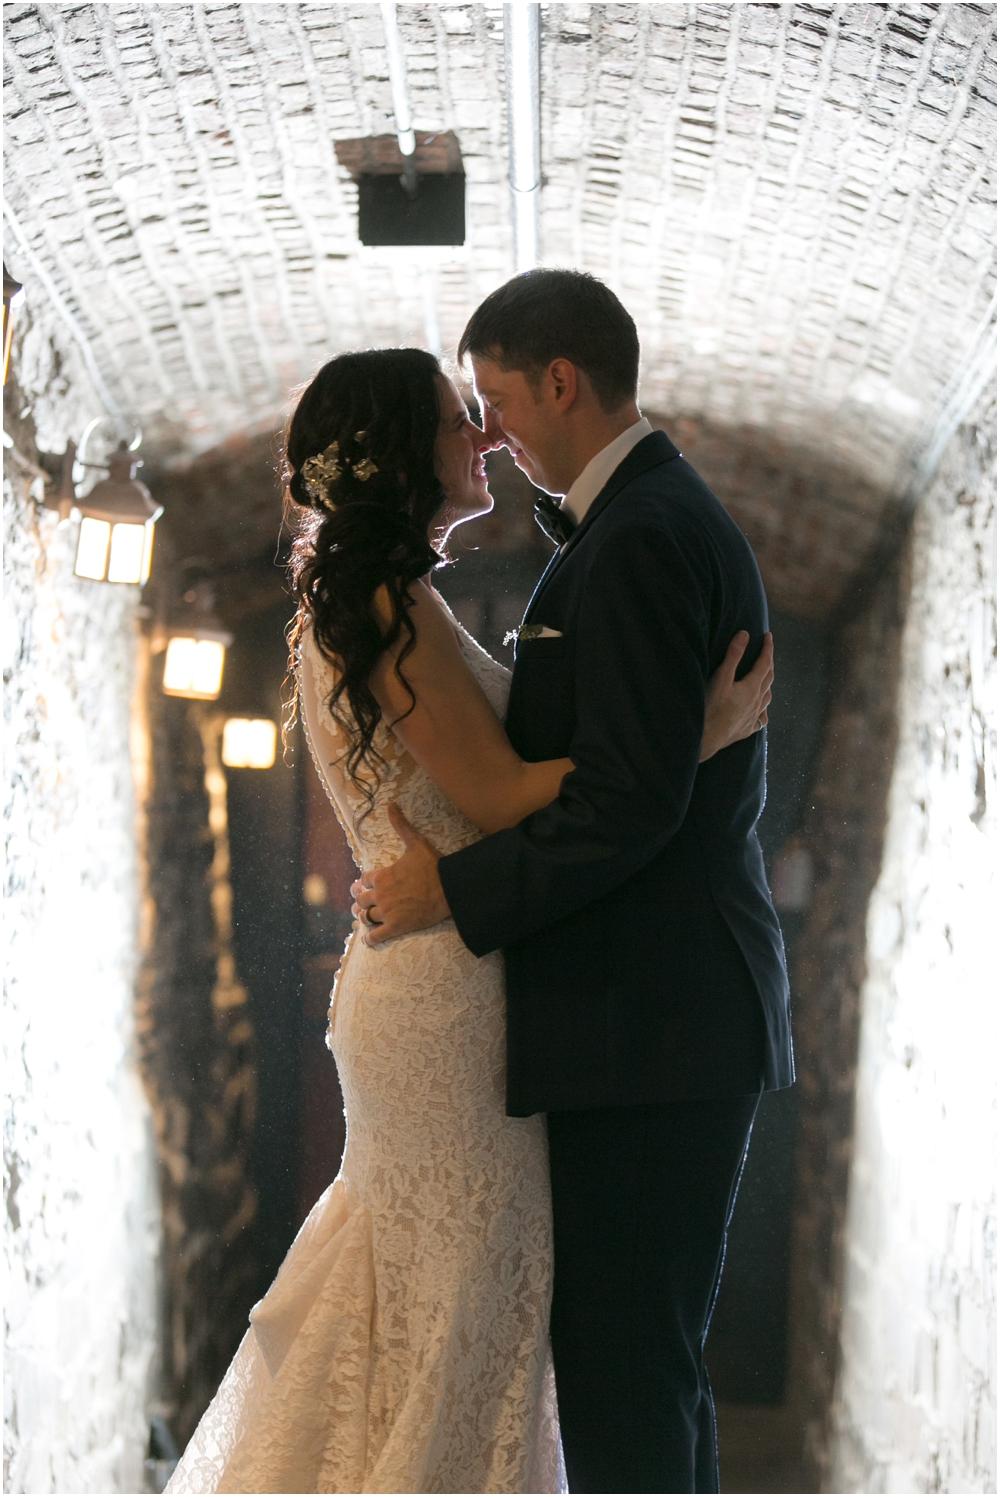 Keith's-Brewery-Wedding-Chantal-Ruthier-Photography_0036.jpg